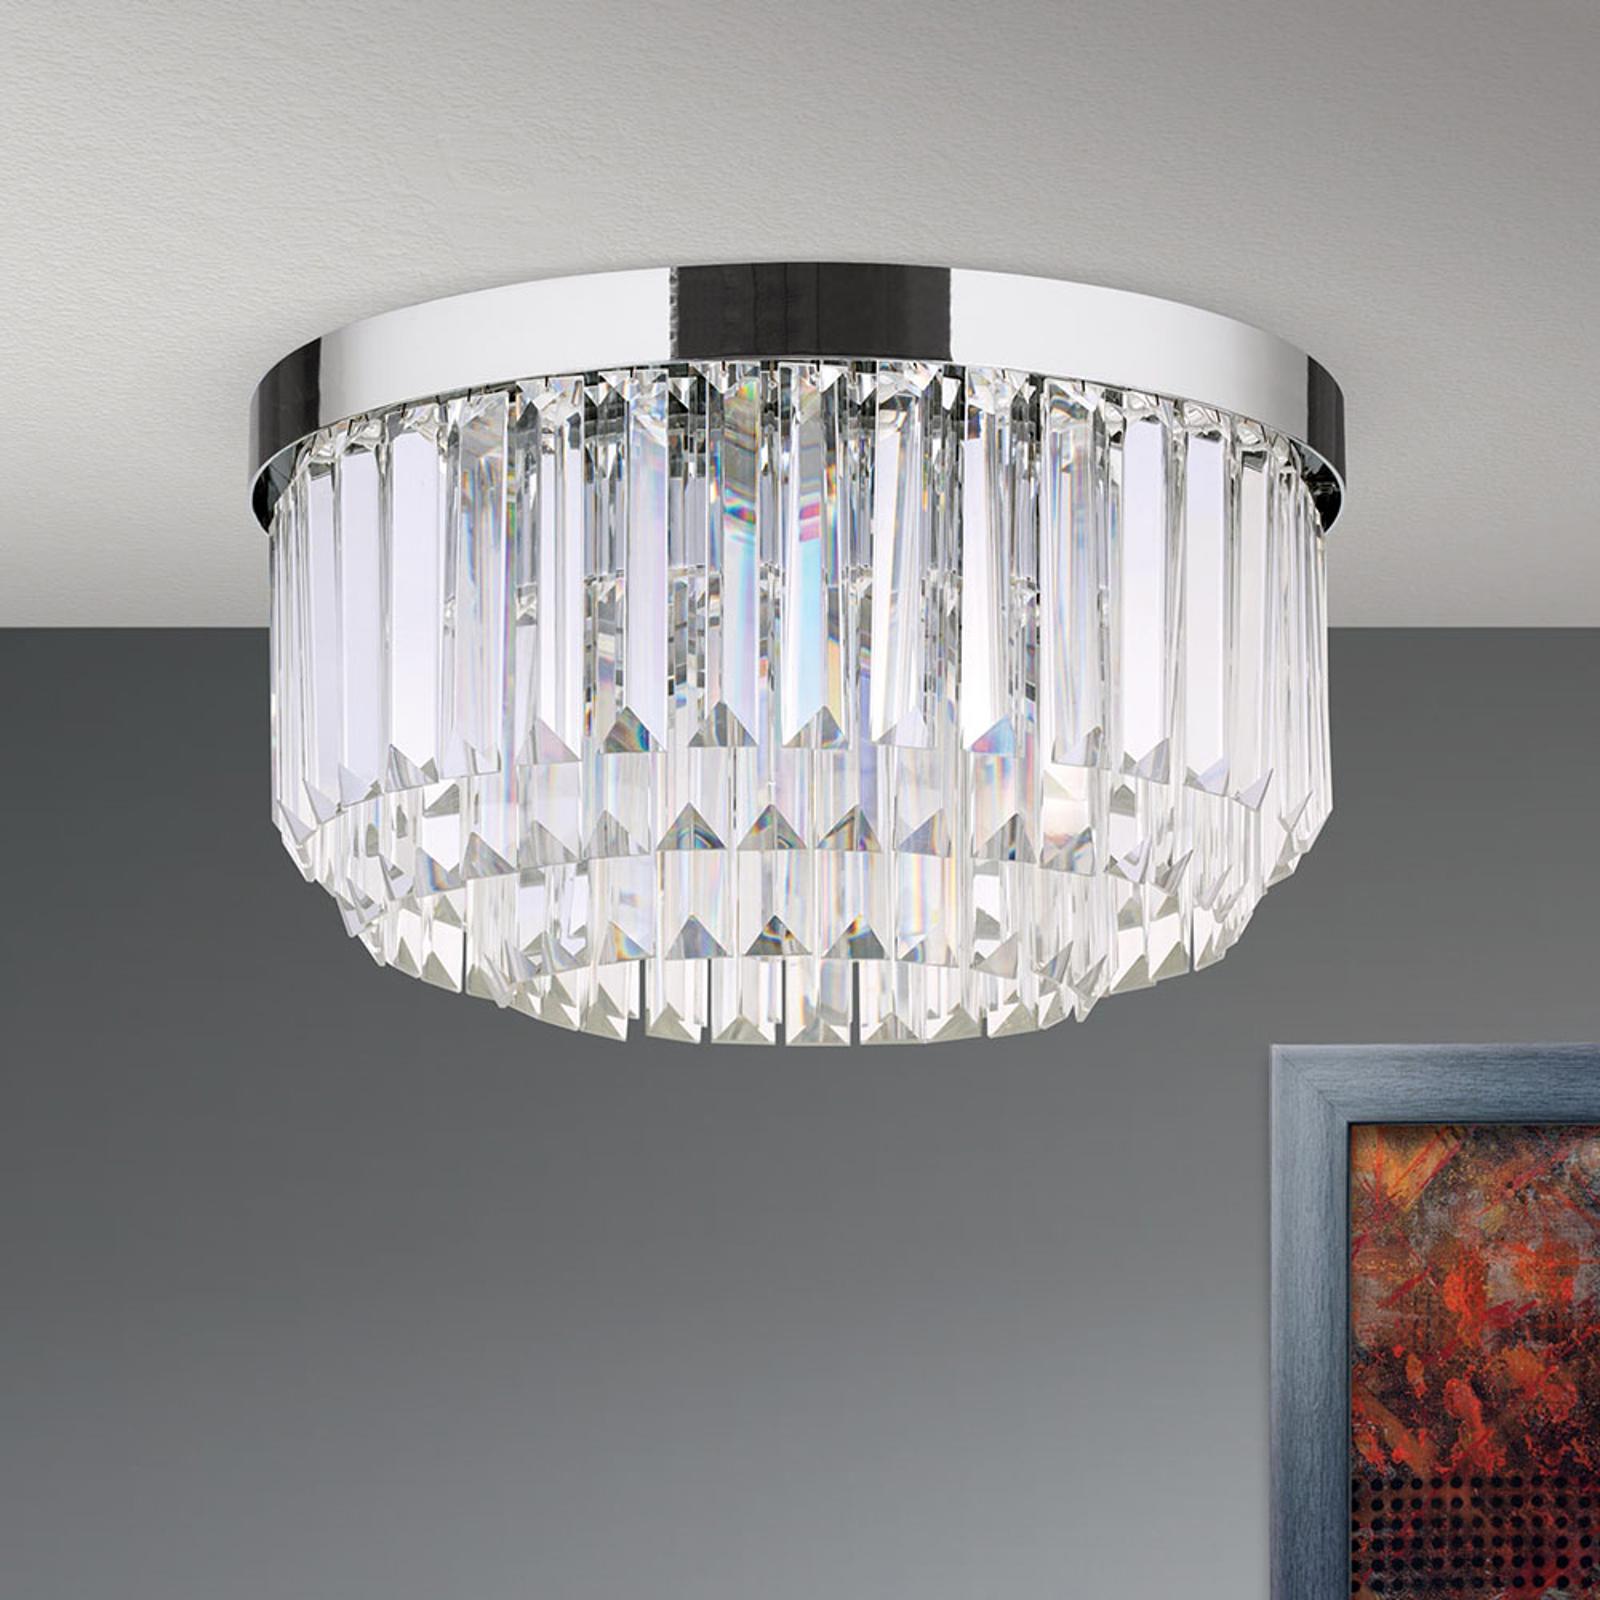 Lampa sufitowa LED Prism, chromowa, Ø 35 cm